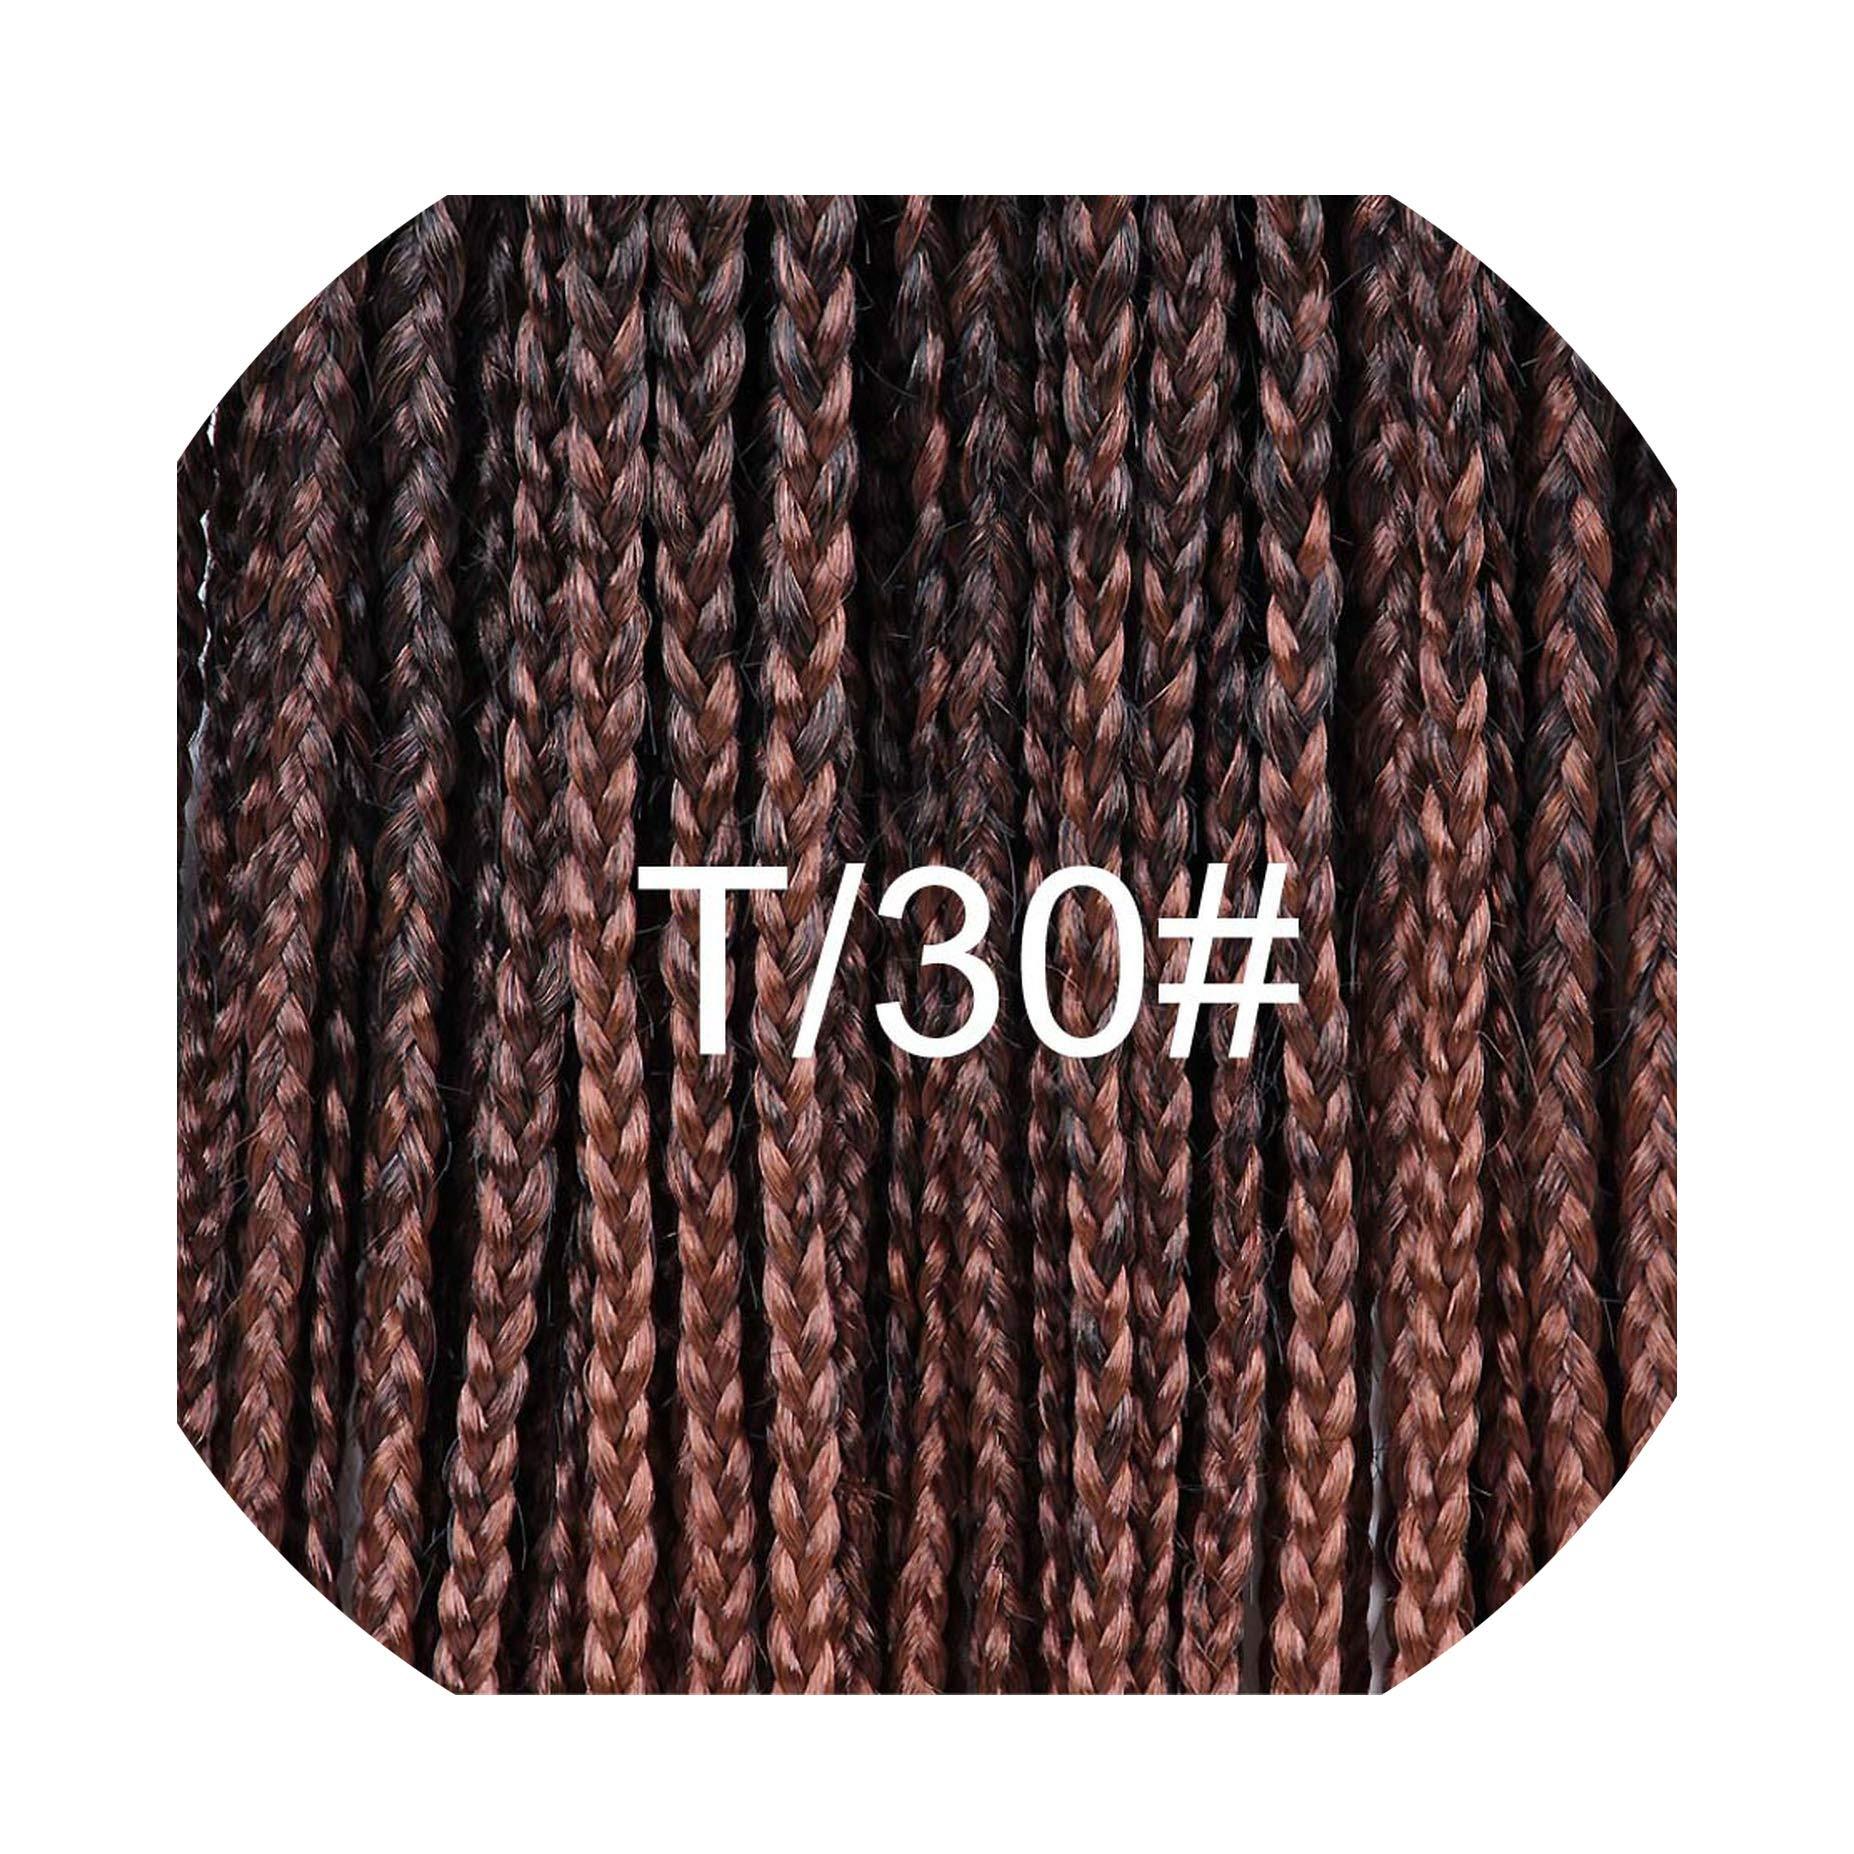 12-30 Inch Crochet Box Braids Hair Extensions Long Black Brown Burgundy Ombre Crochet Braids Kanekalon Synthetic Hair,T1B/30,20inches,9Pcs/Lot by Ting room